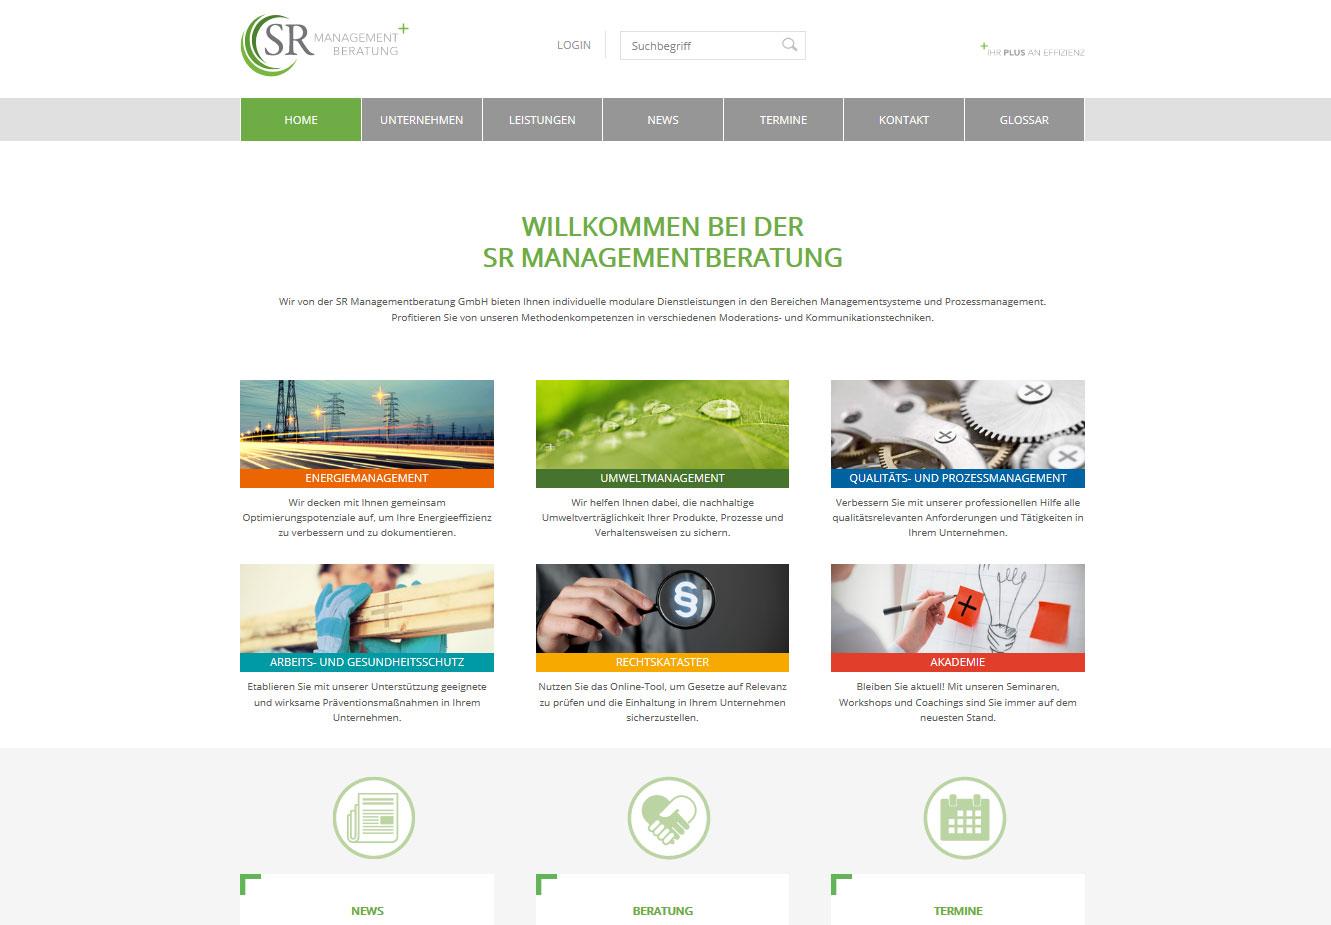 Webseiten-Erstellung Werbeagentur Haas Dresden: SRMB